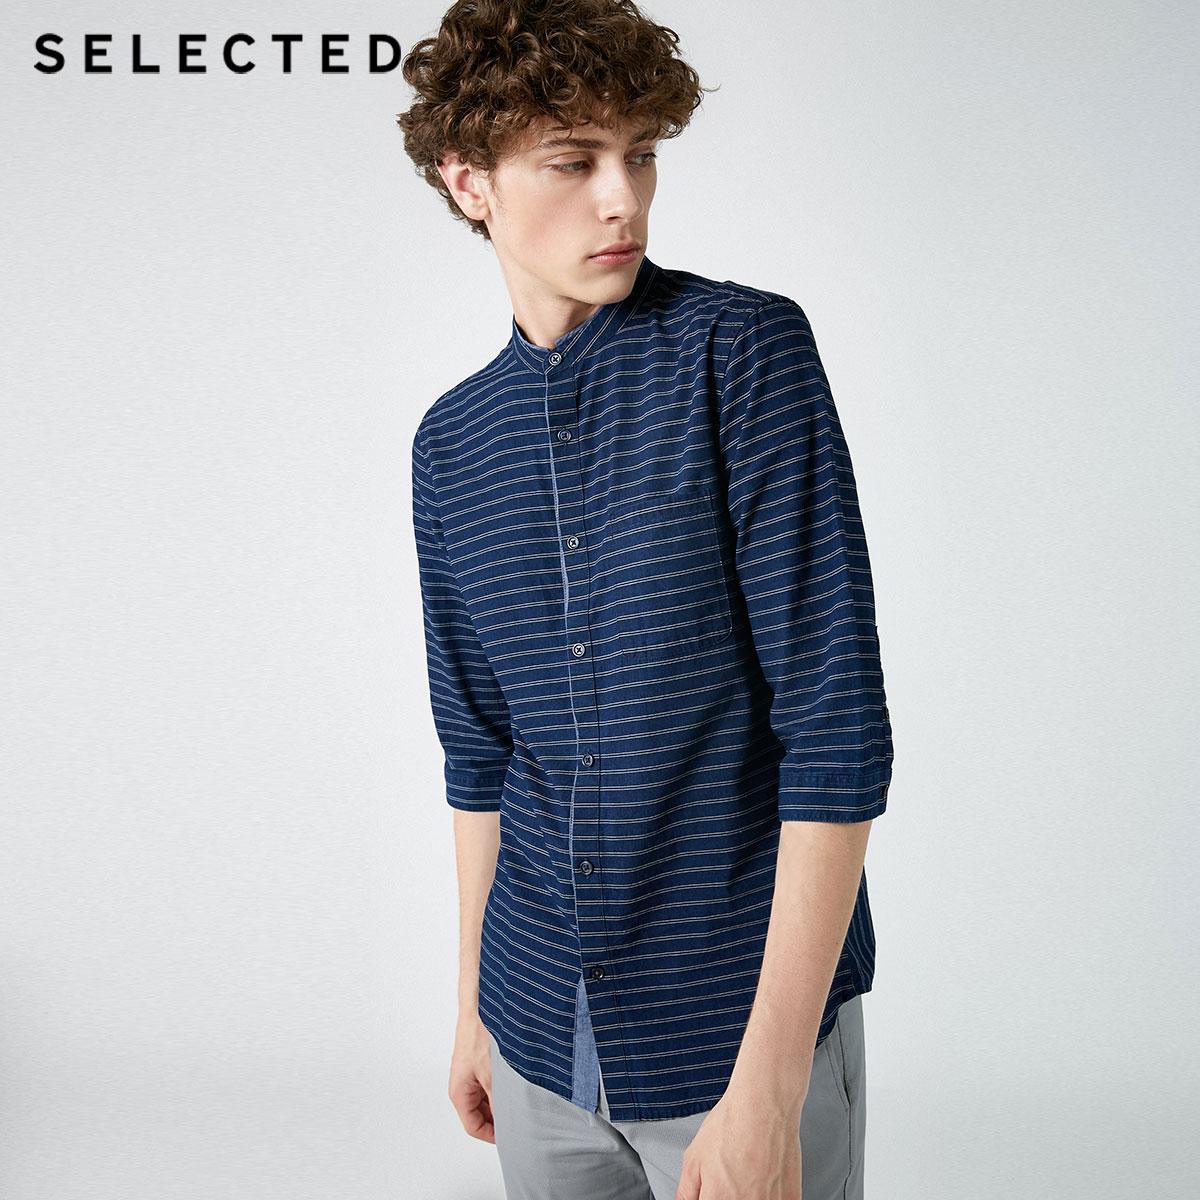 Selected Men's Summer 3/4 Sleeves Denim Shirt C 418331509